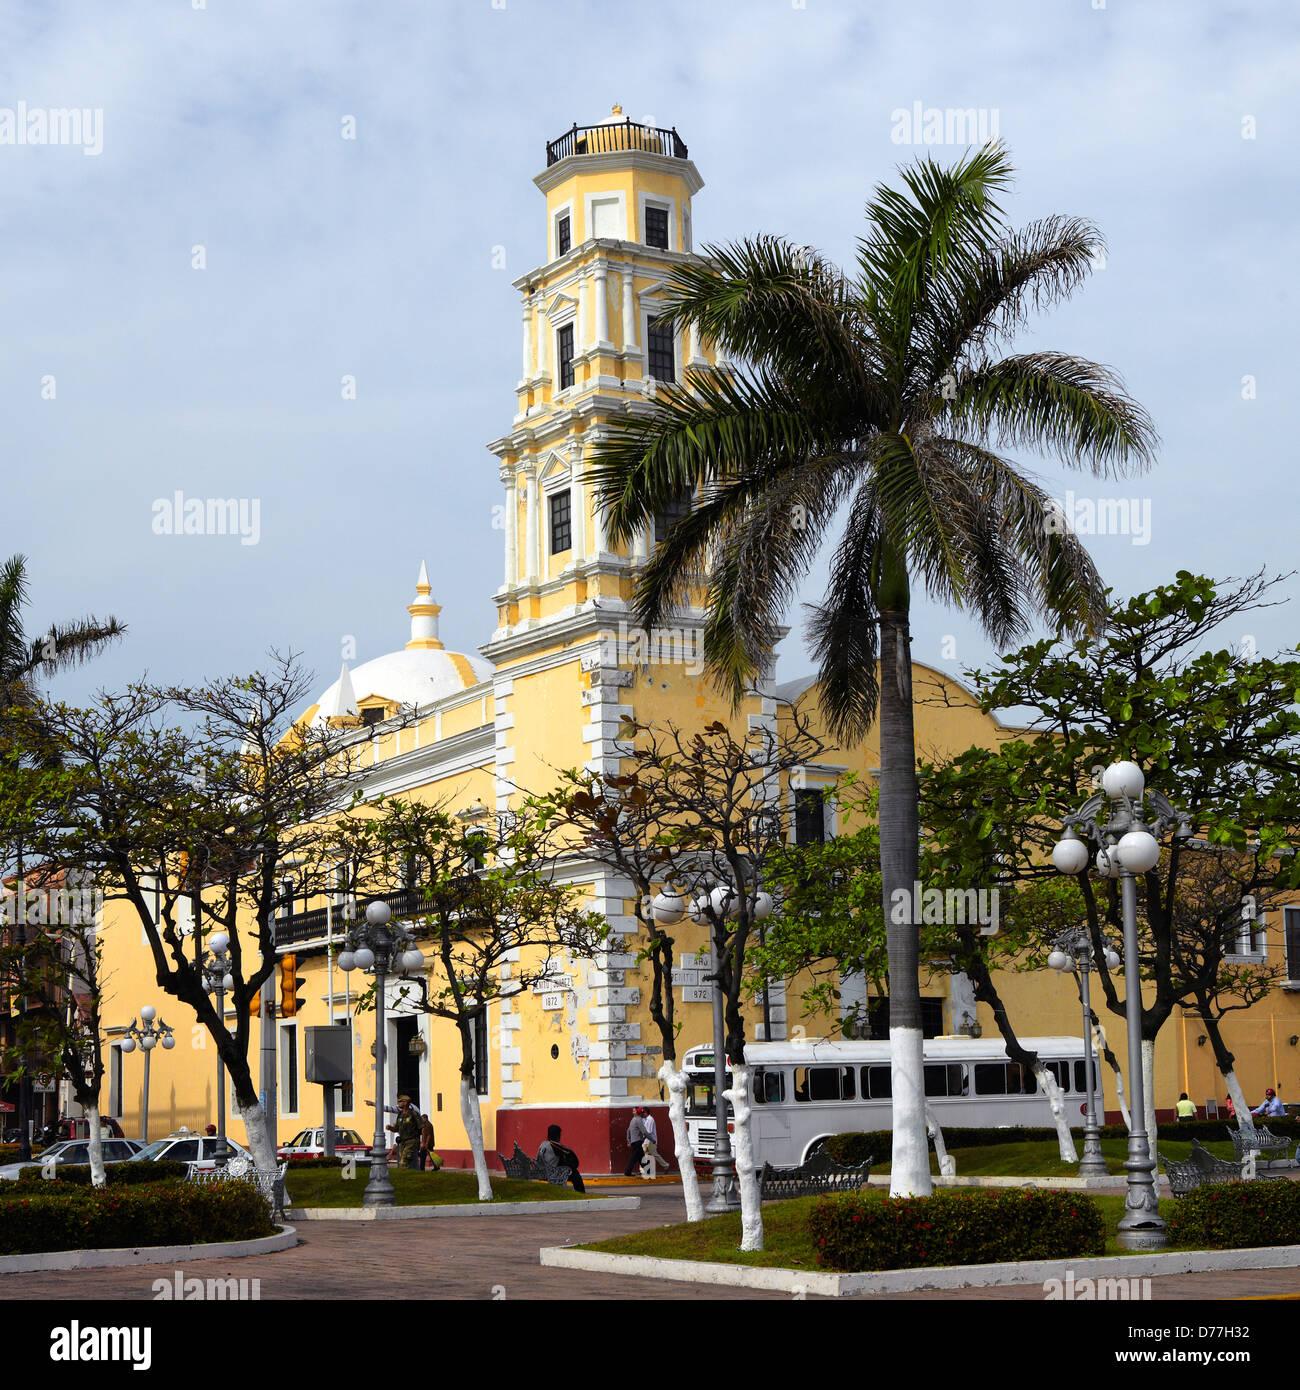 Mexico Veracruz city old lighthouse Benito Juarez - Stock Image